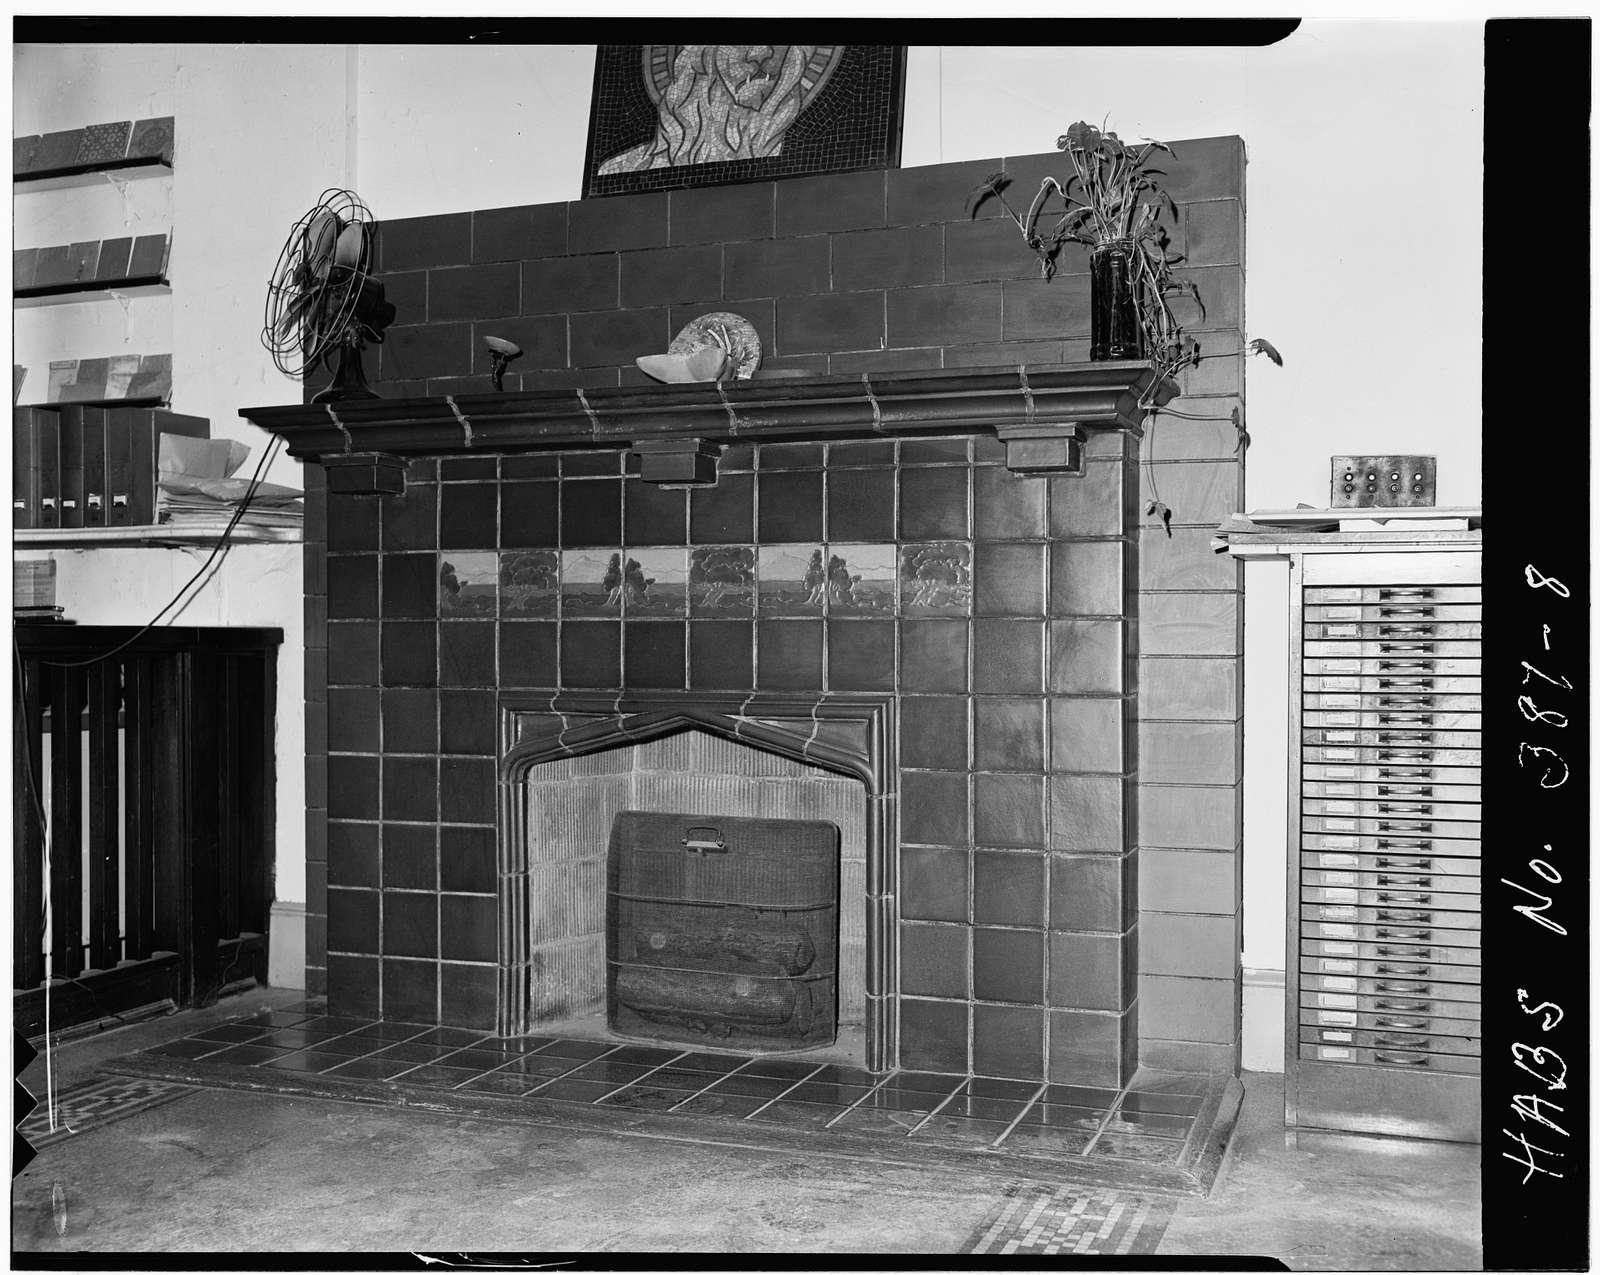 American Mosaic Company Building, 912 I Street Northwest, Washington, District of Columbia, DC